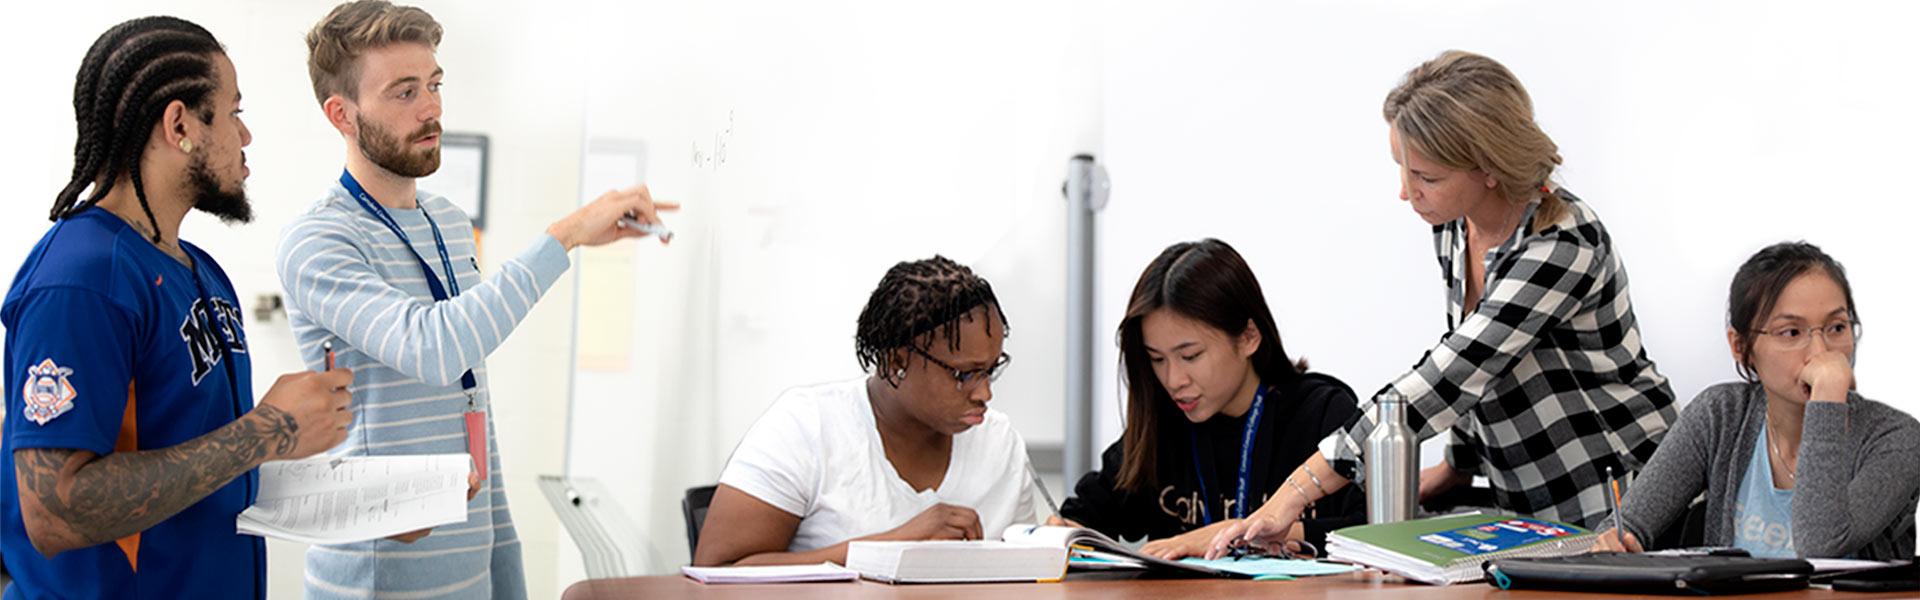 tutors helping students